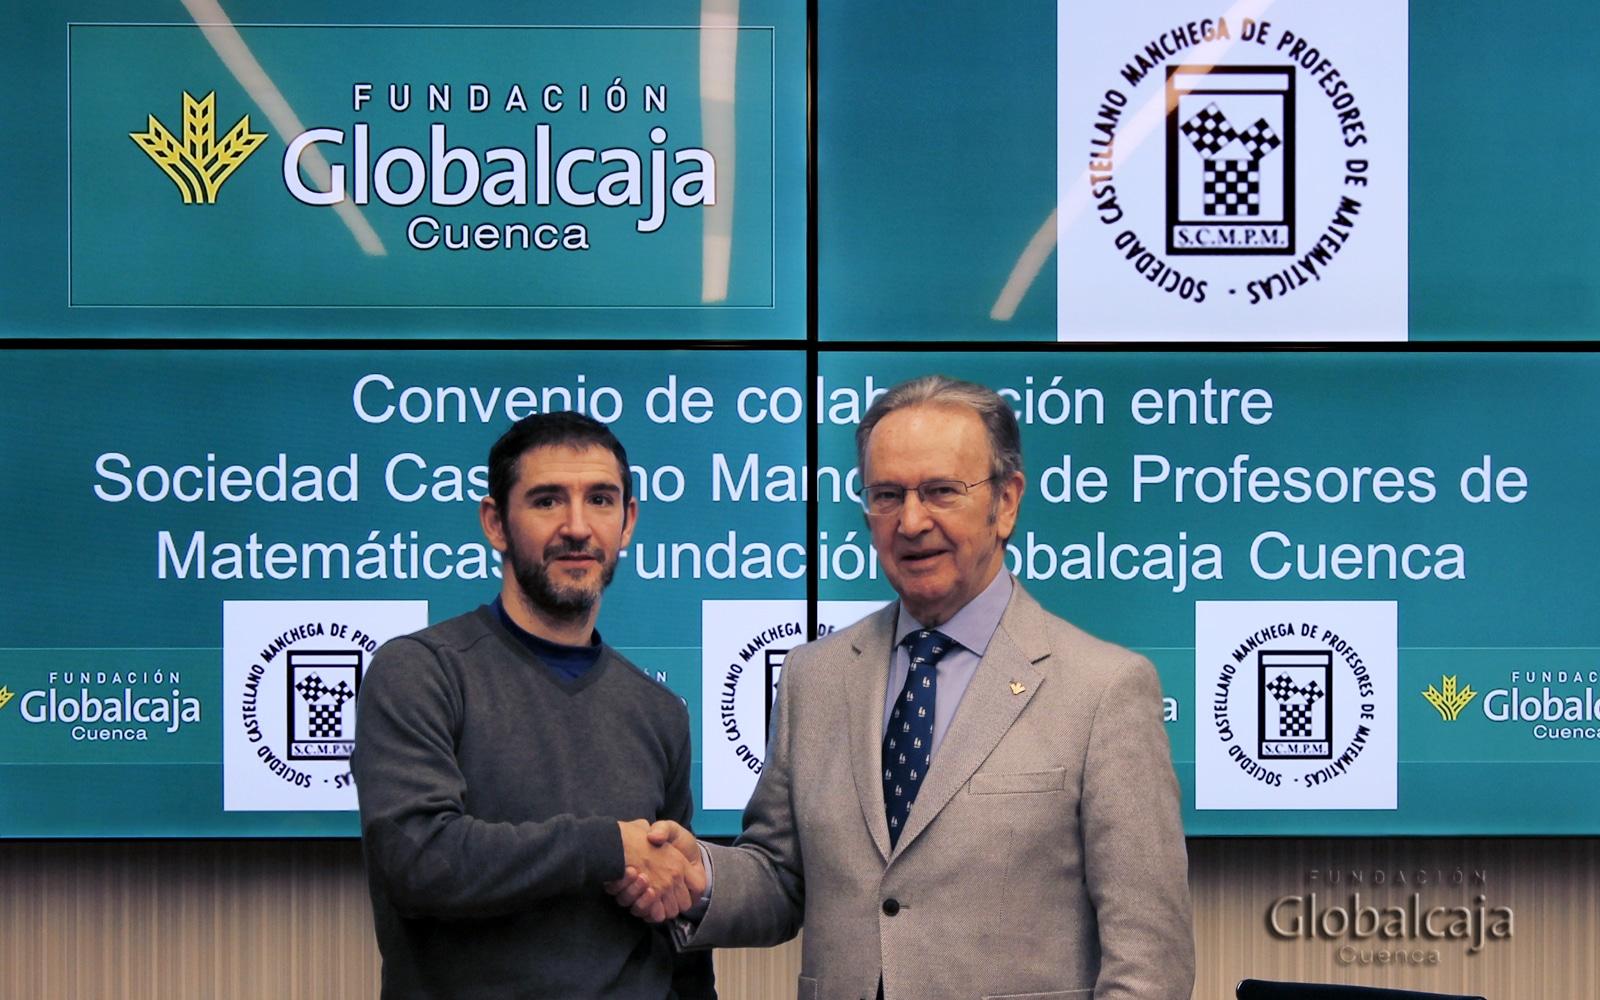 https://blog.globalcaja.es/wp-content/uploads/2018/04/nuevos-talentos-matematicos.jpg